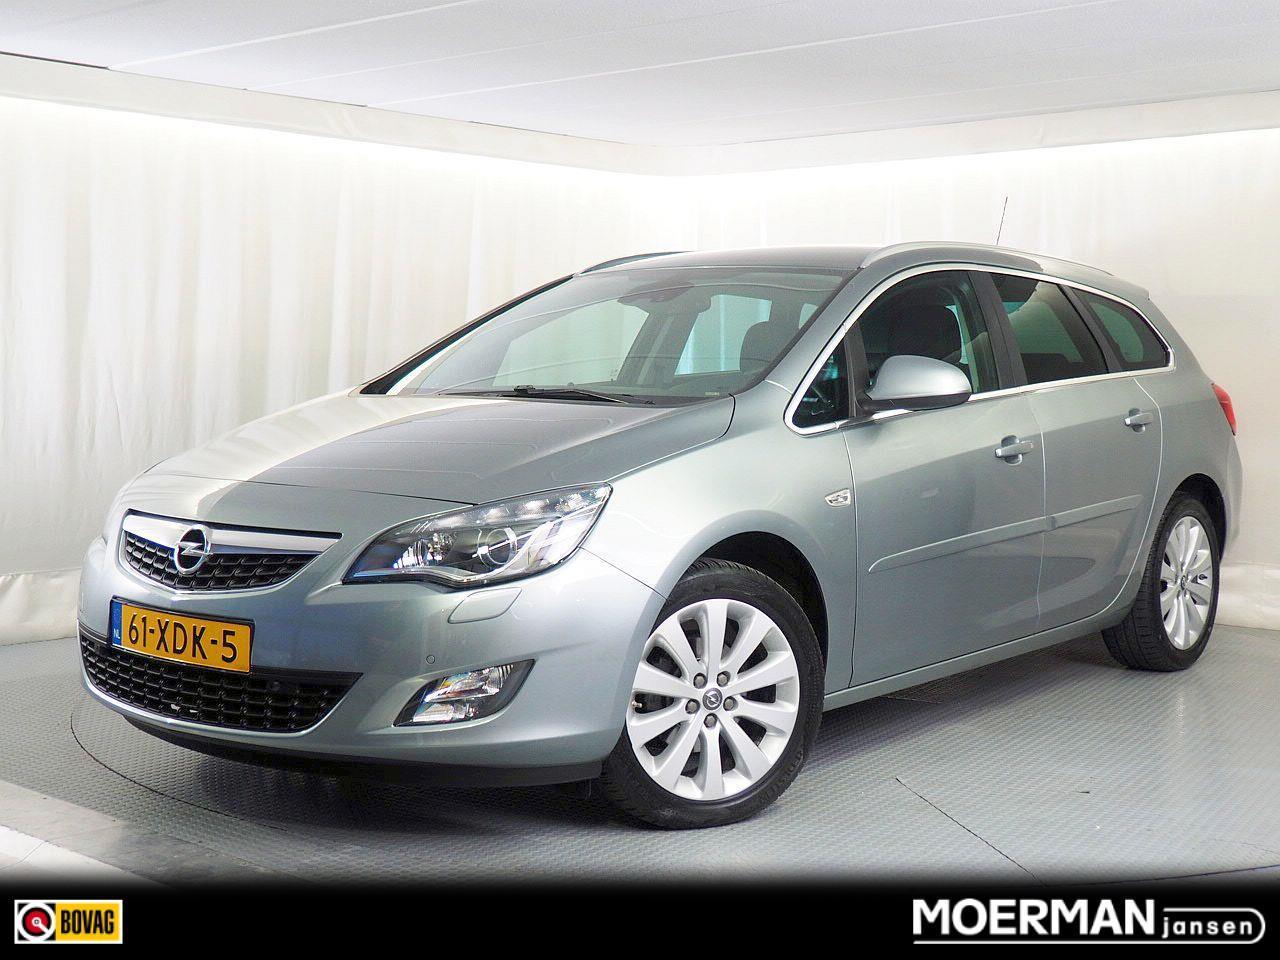 Opel Astra Sports tourer 1.4 turbo sport / voll. onderhouden / stationcar / 140 pk / parkeersensoren v+a / trekhaak